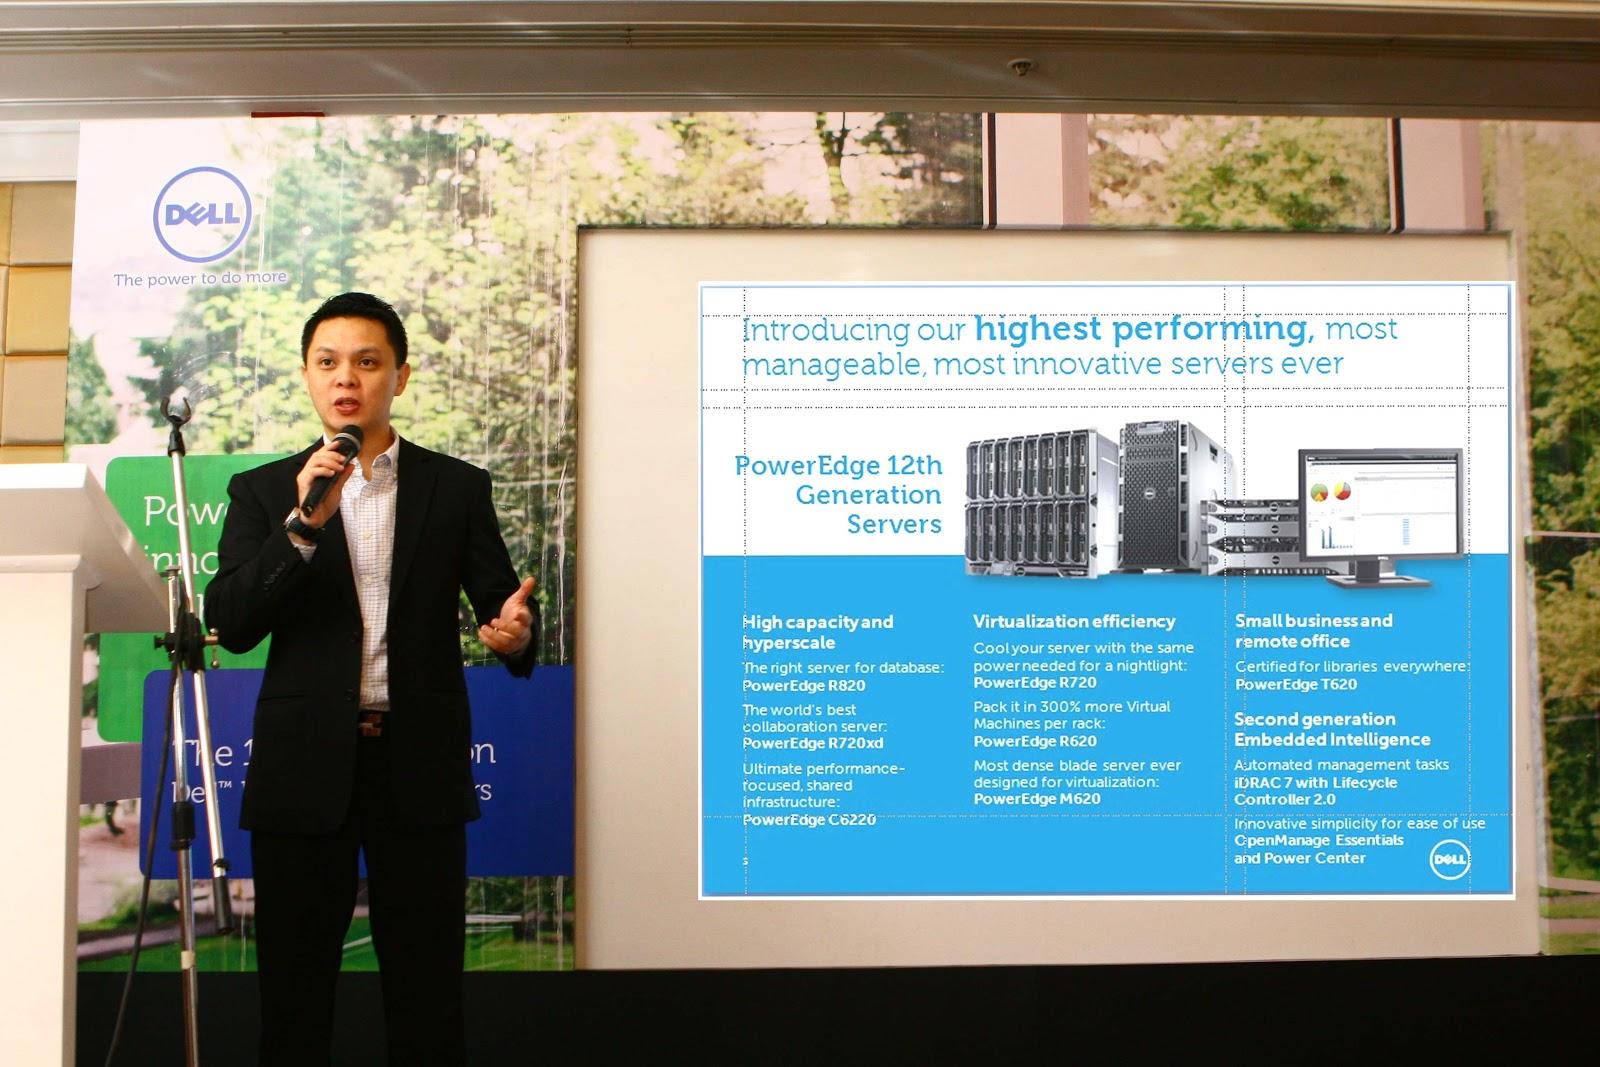 Amazing Jing for Life: Dell Enhances Enterprise Solution